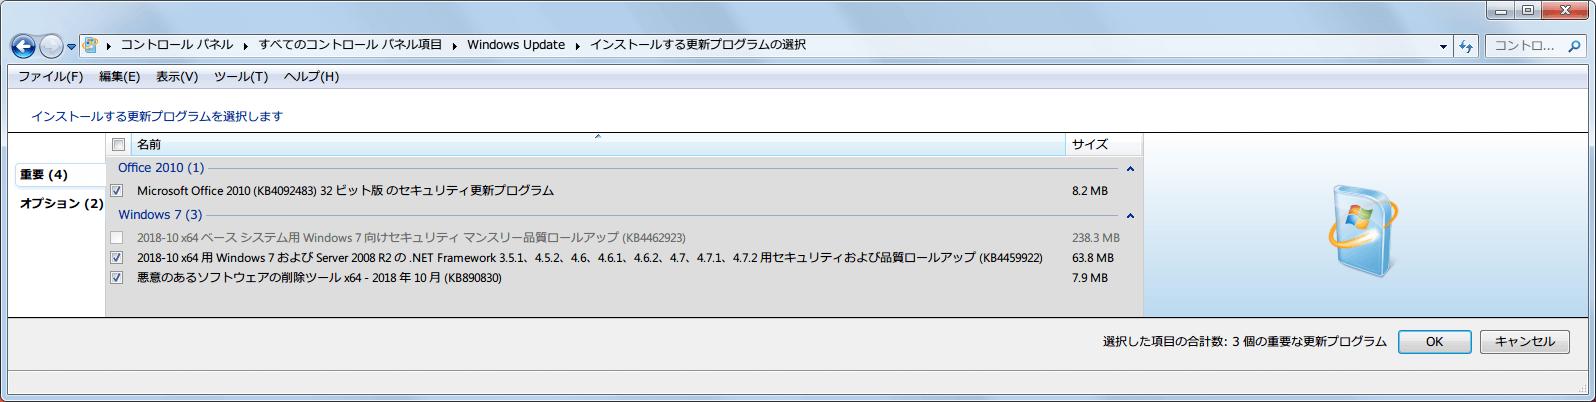 Windows 7 64bit Windows Update 重要 2018年10月分リスト KB4462923 非表示